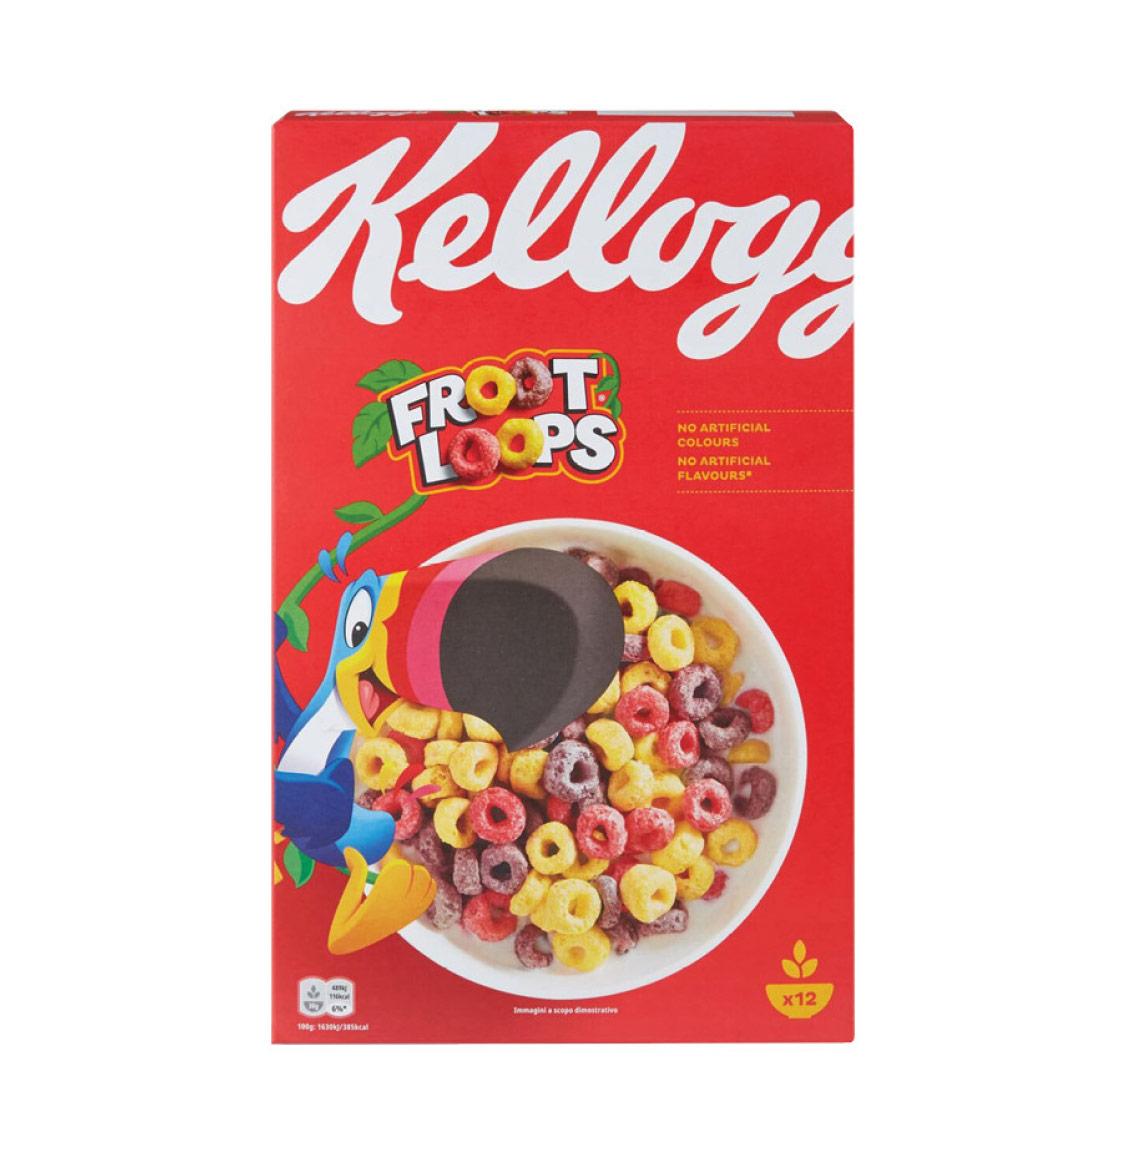 Kellogg's Froot Loops Δημητριακά 375g